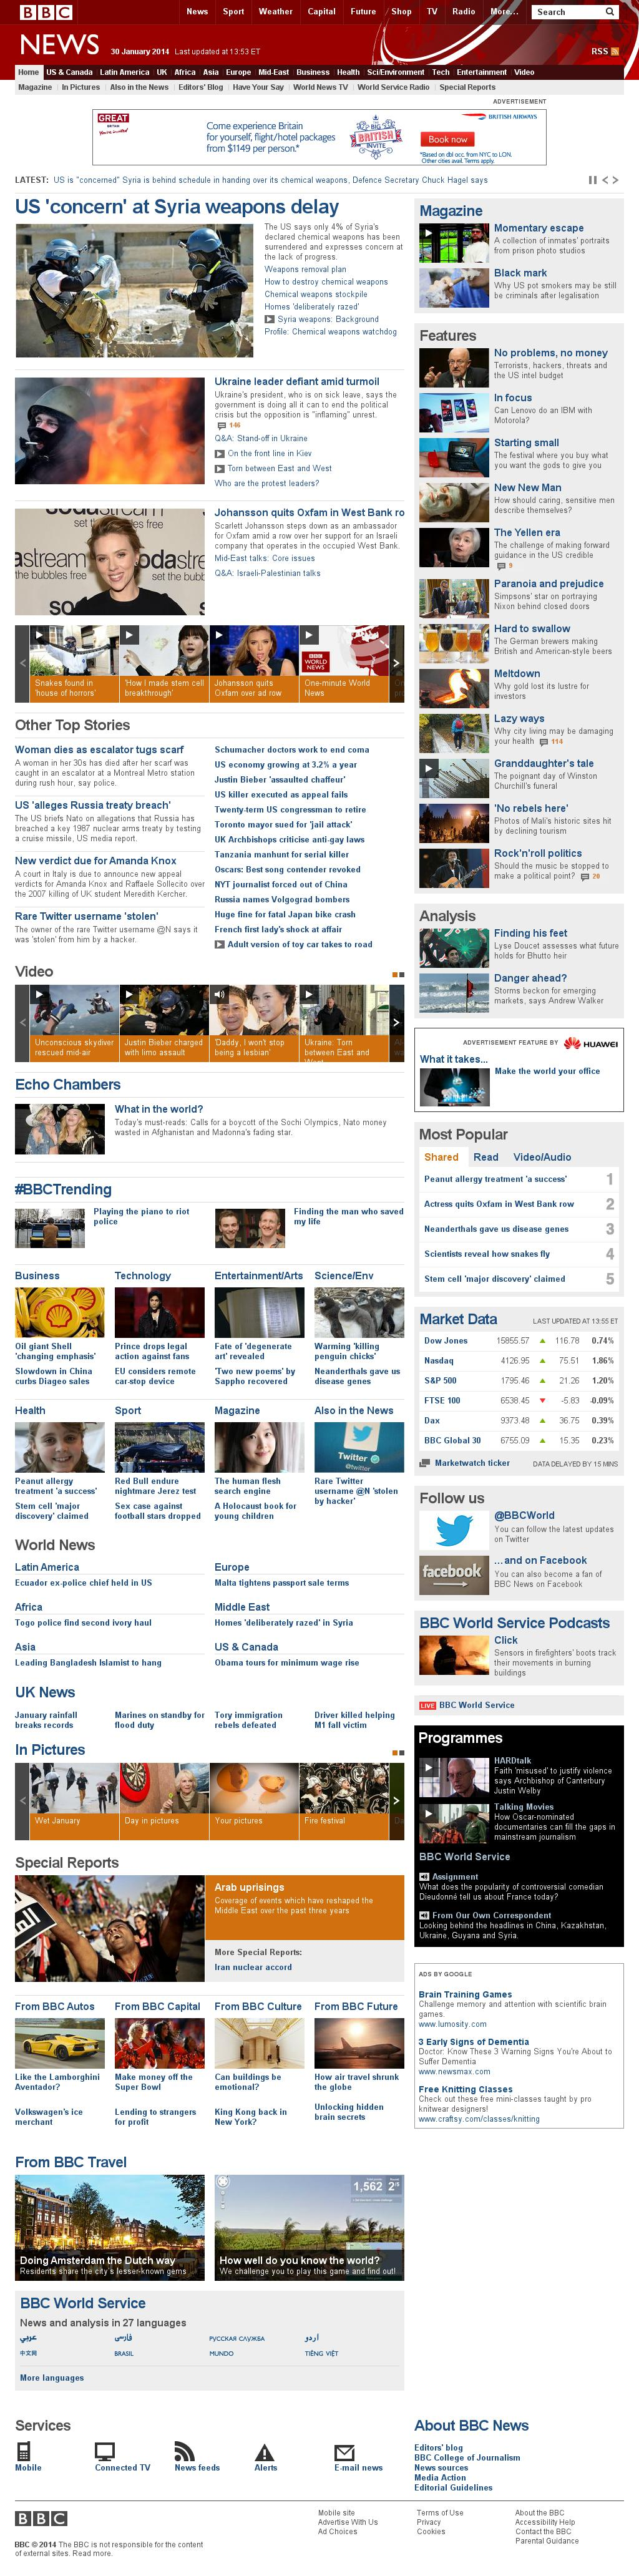 BBC at Thursday Jan. 30, 2014, 7 p.m. UTC